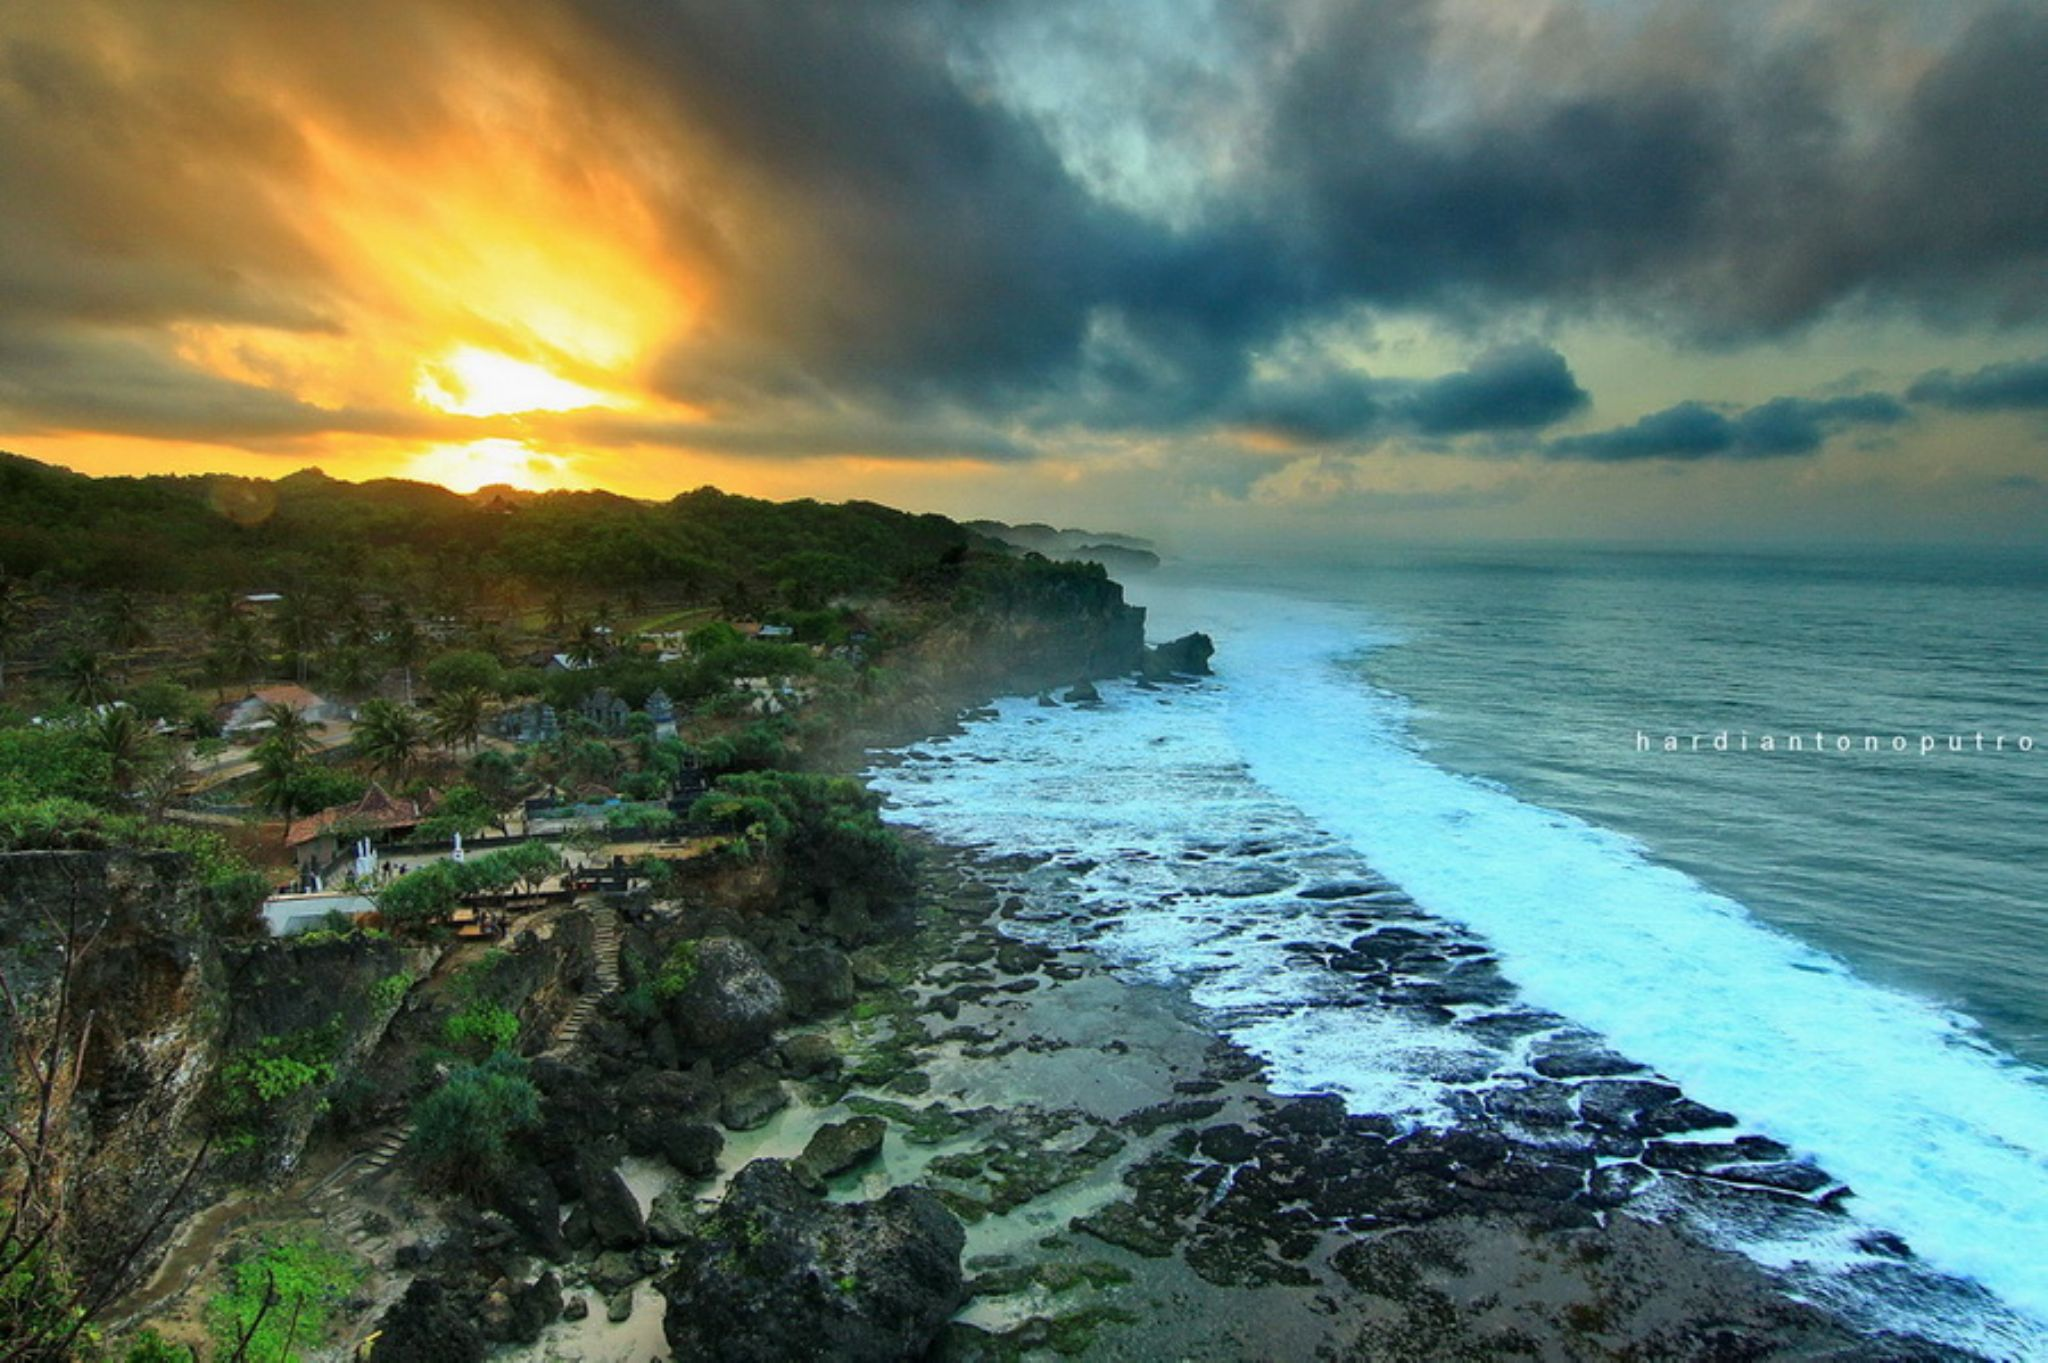 Ngobaran Beach by hardiantonoputro